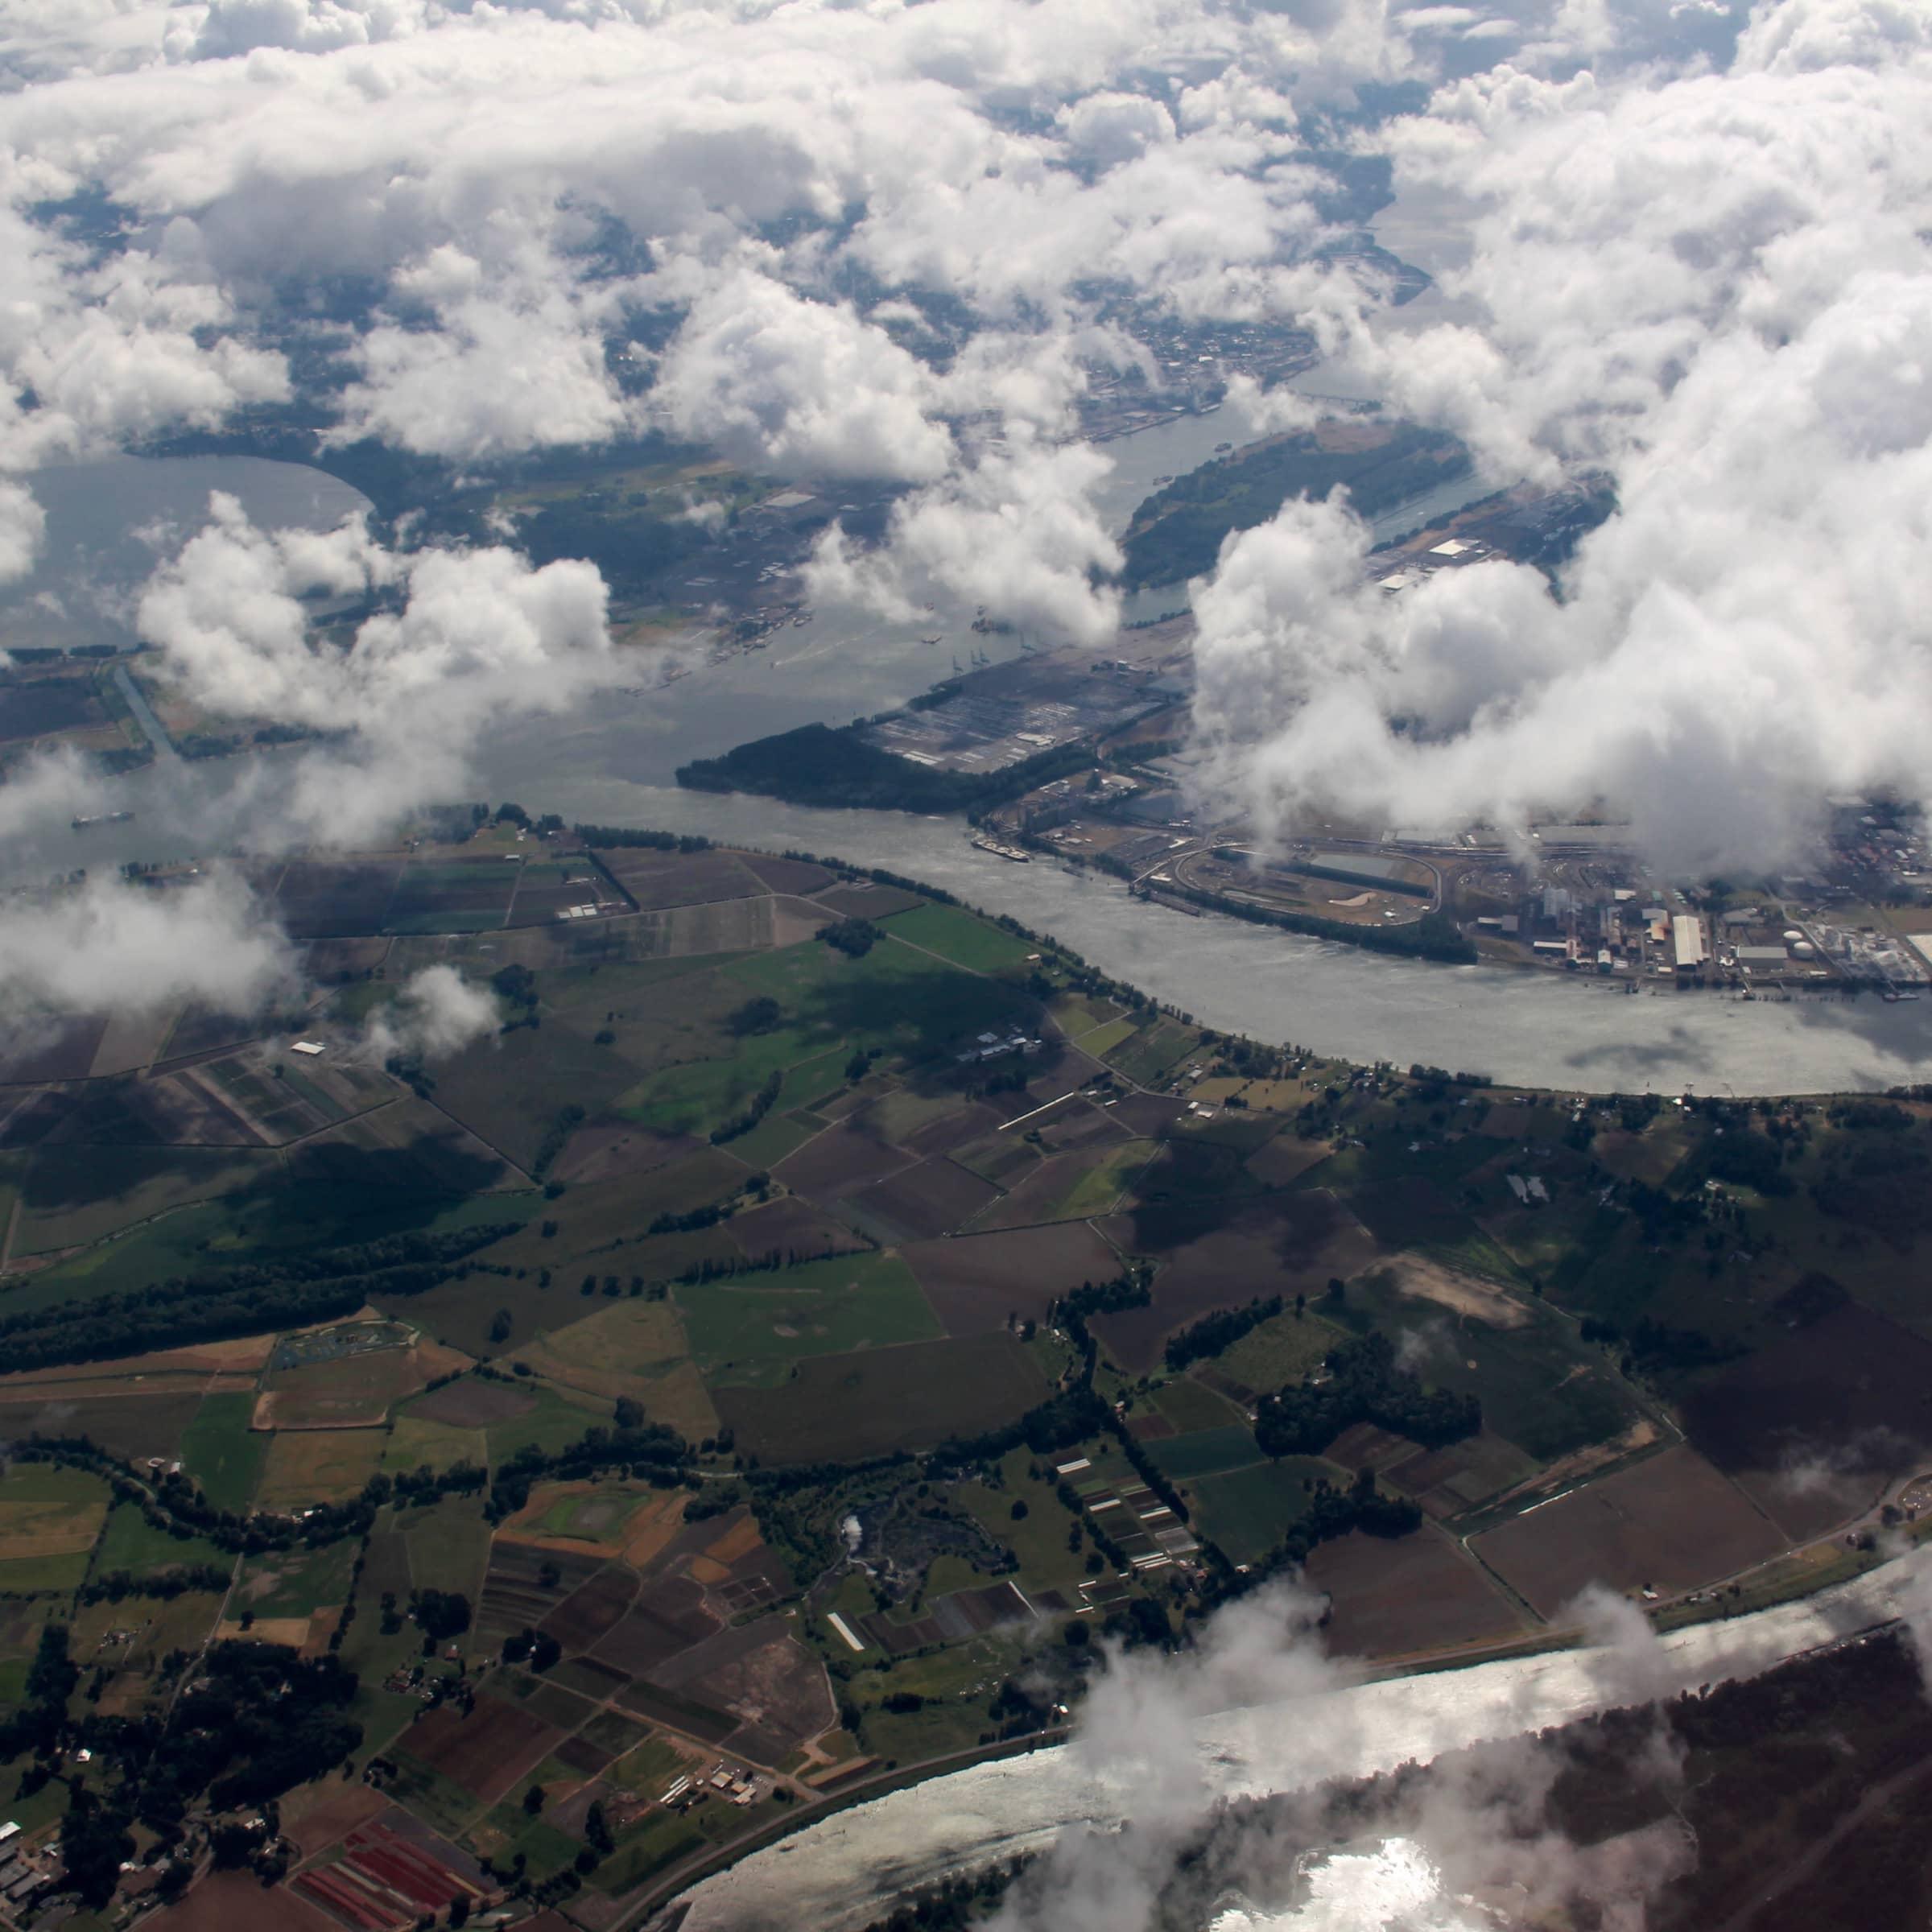 Vancouver Lake, Columbia River, Willamette River, and Multnomah Channel